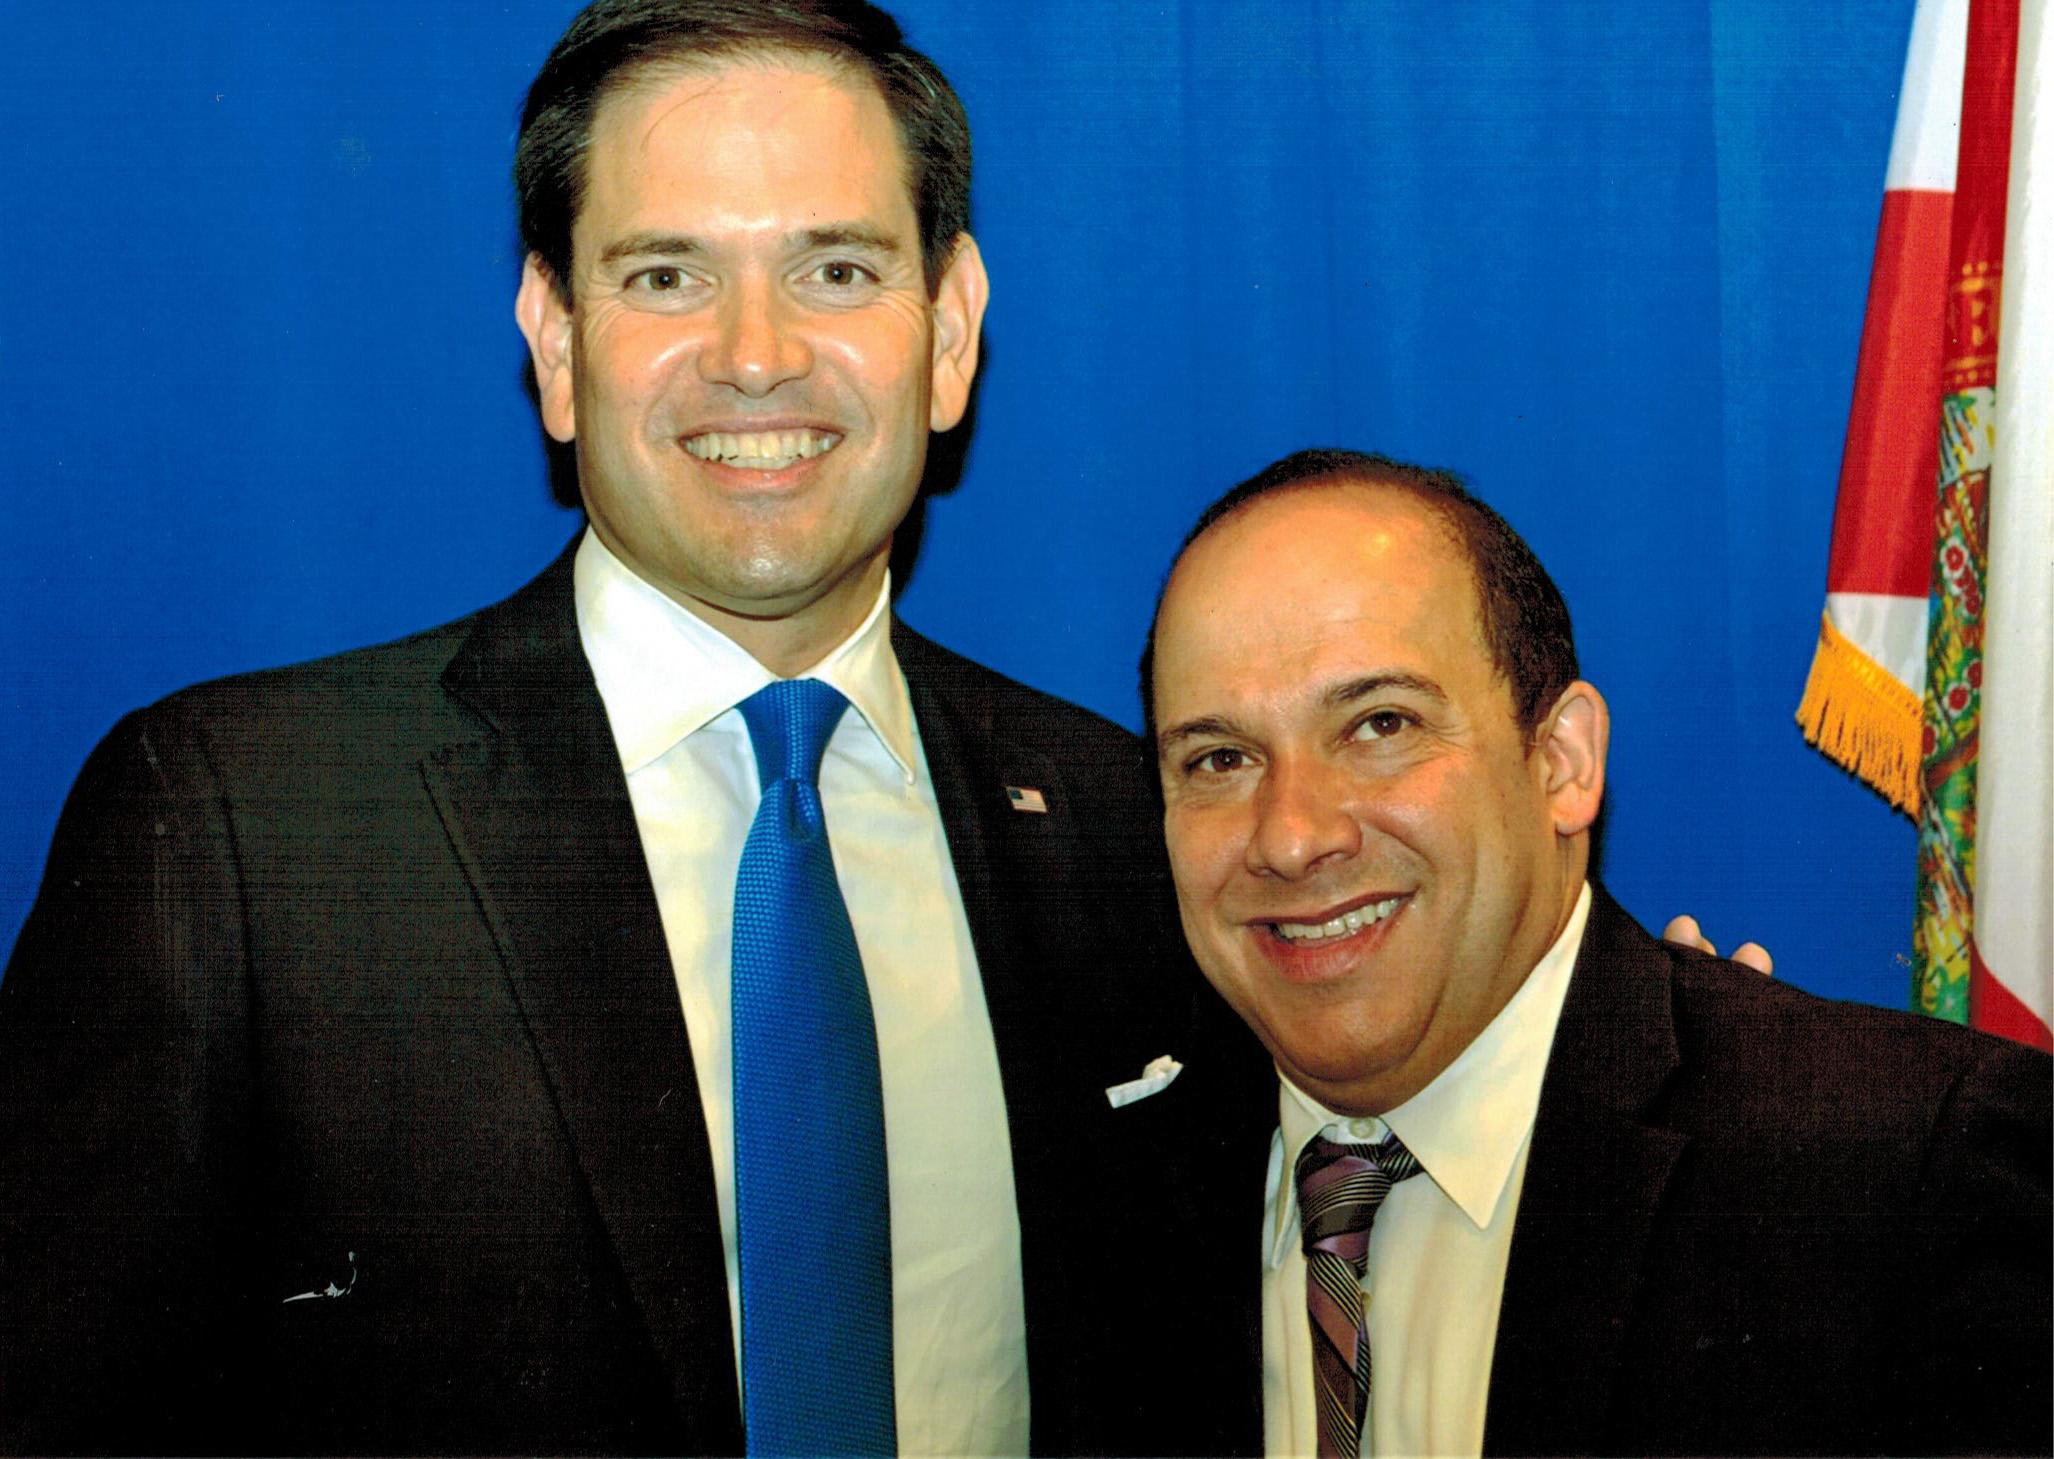 JB with U.S. Senator Marco Rubio